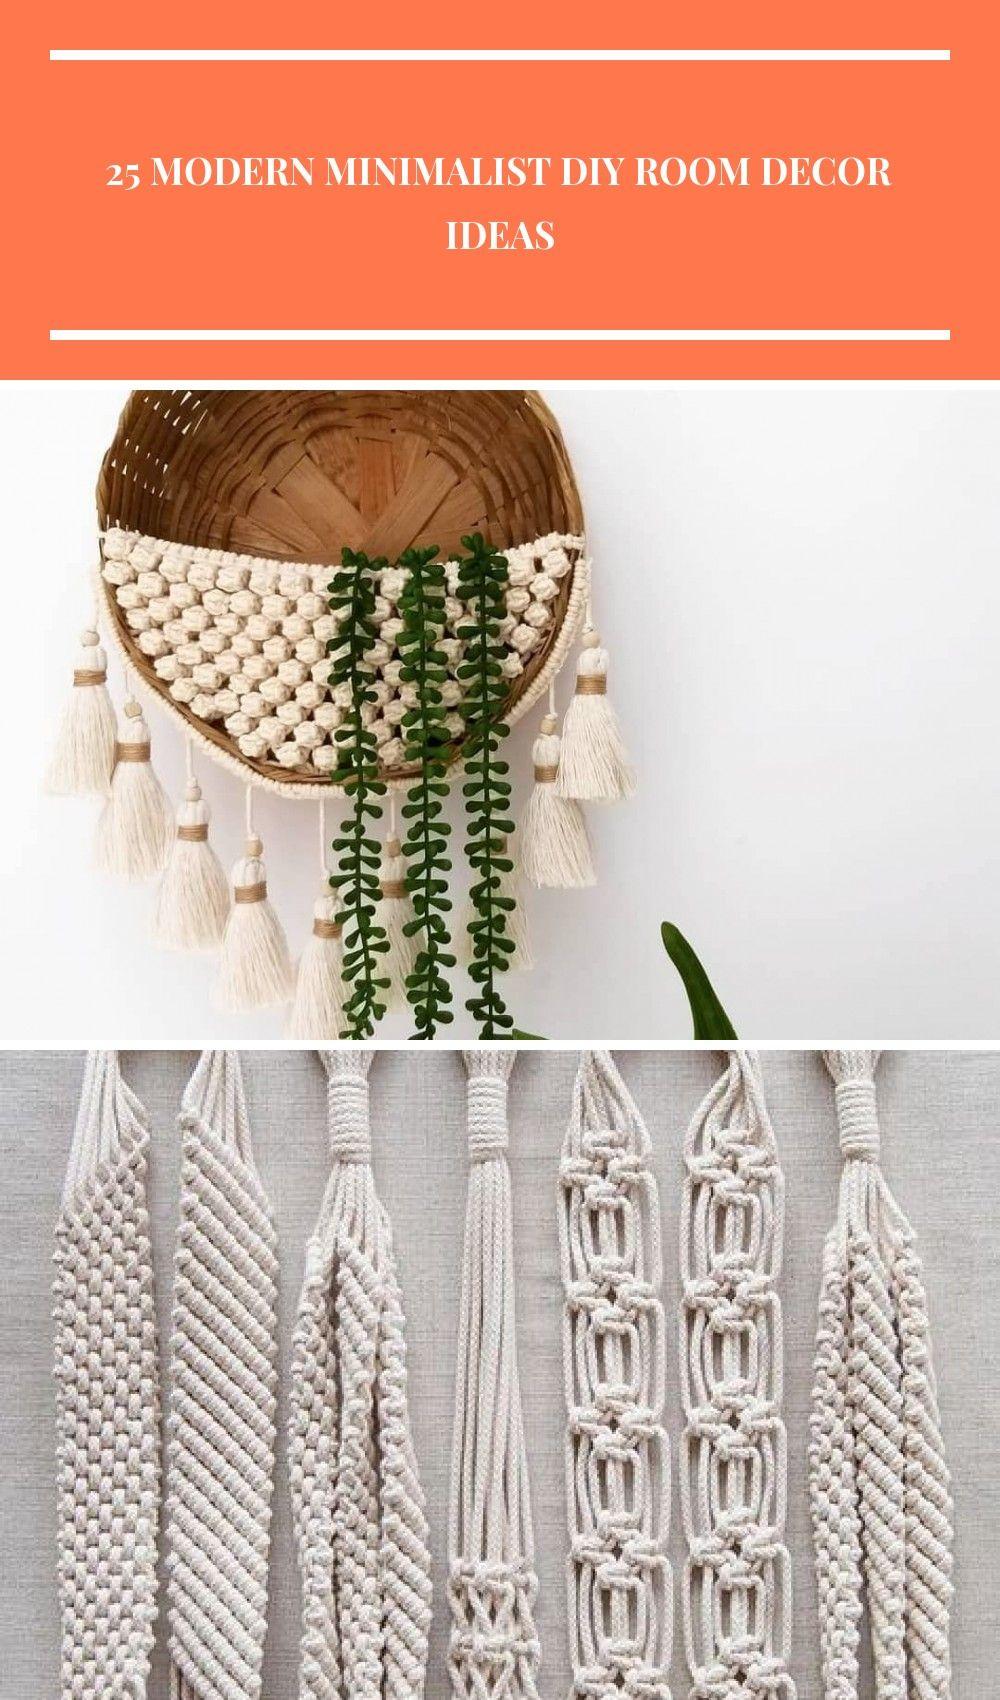 Work of @cactus.macrame • • • • •  #macramewalldecor#macramemoment #macramedecor #creativehappylife #crafts #macrame #macrameart… diy home plants #cactuscraft